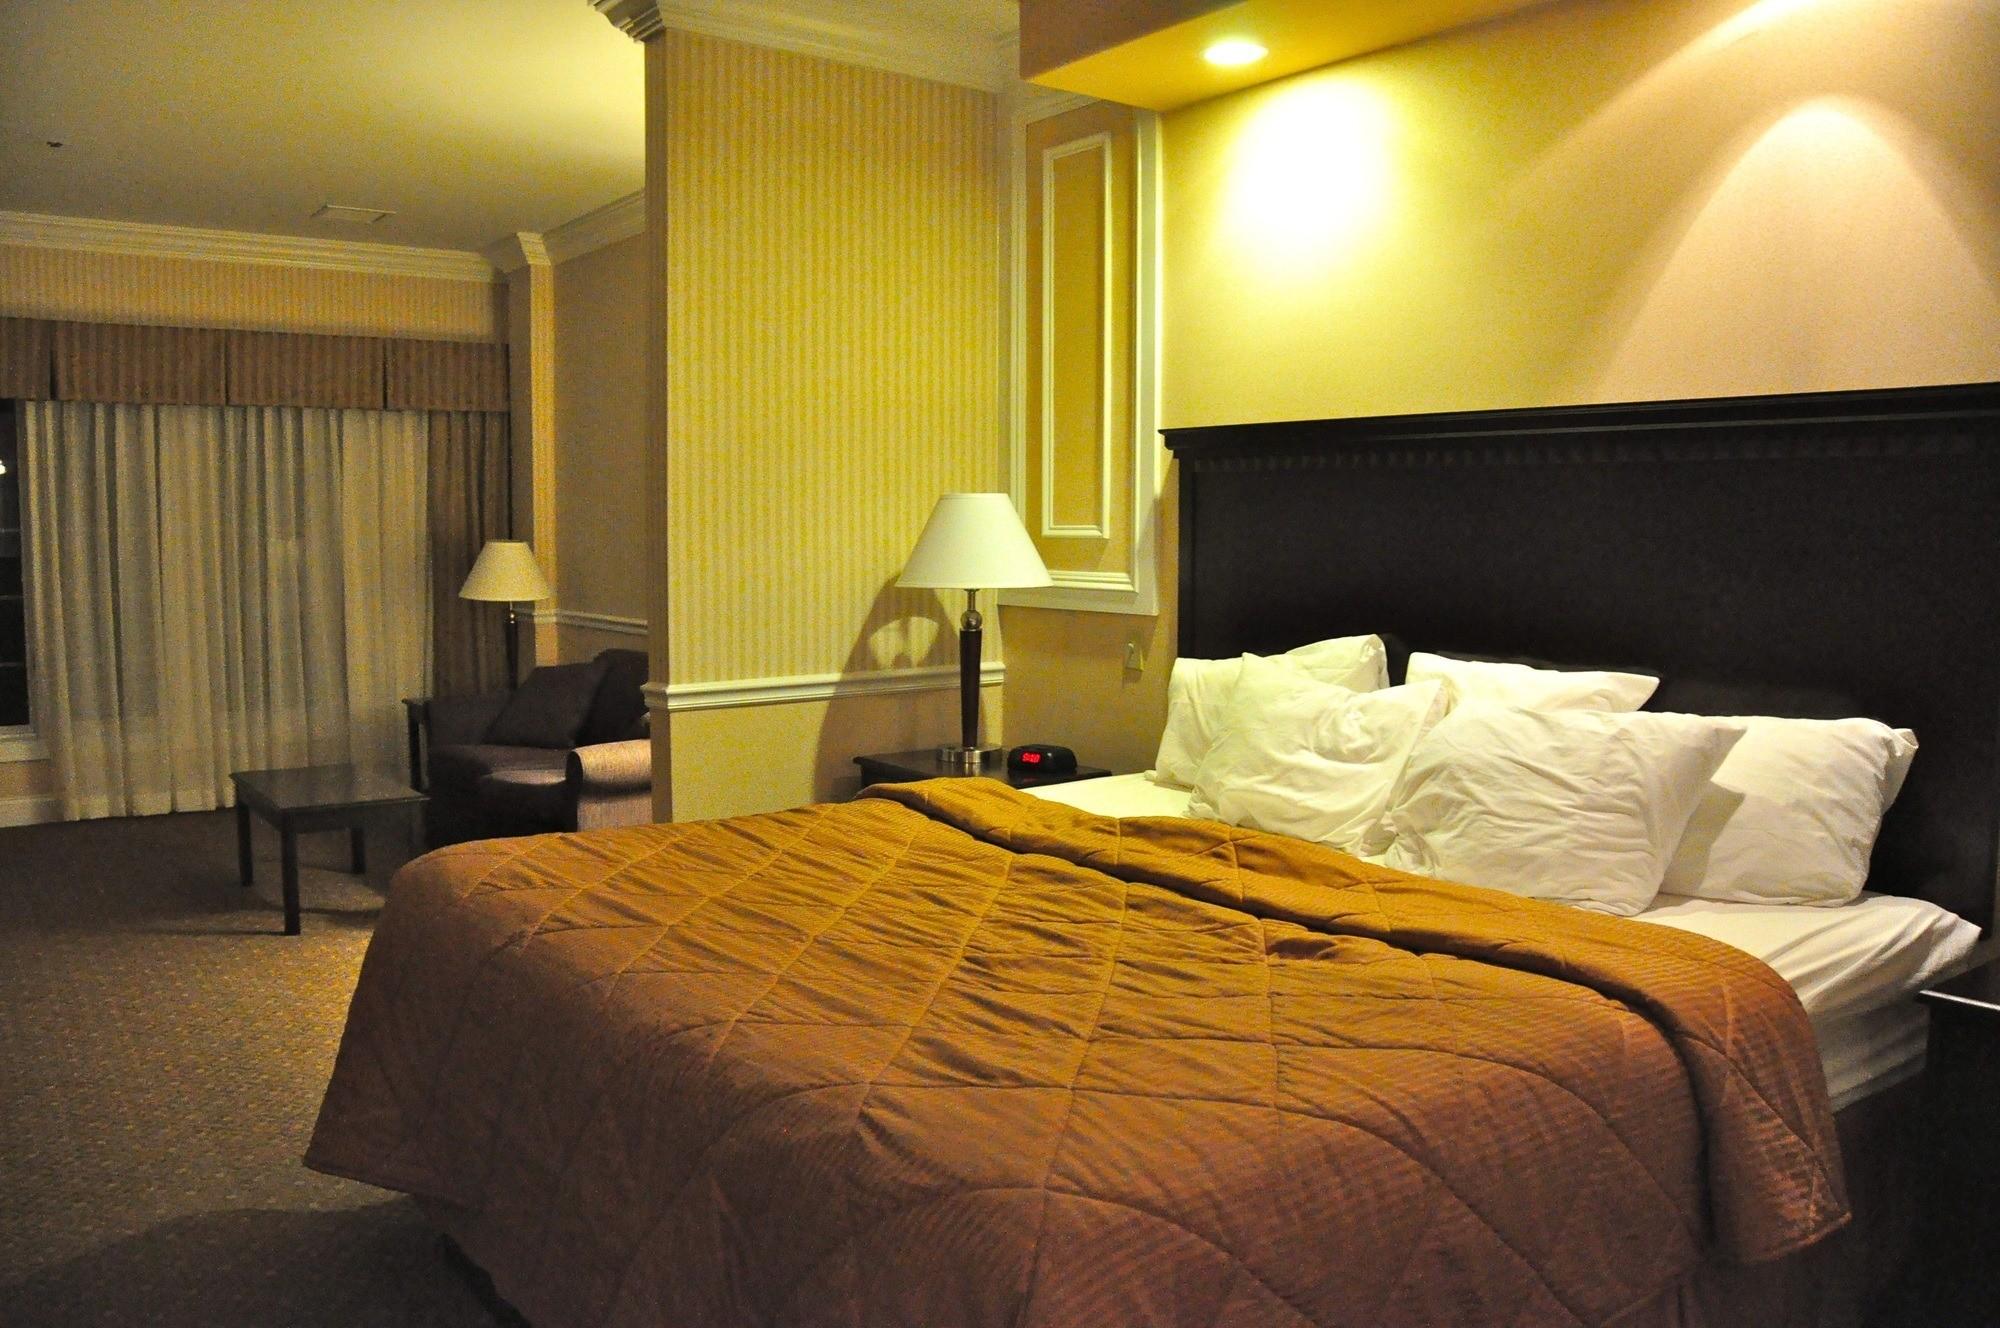 kid-friendly hotel plattsburgh